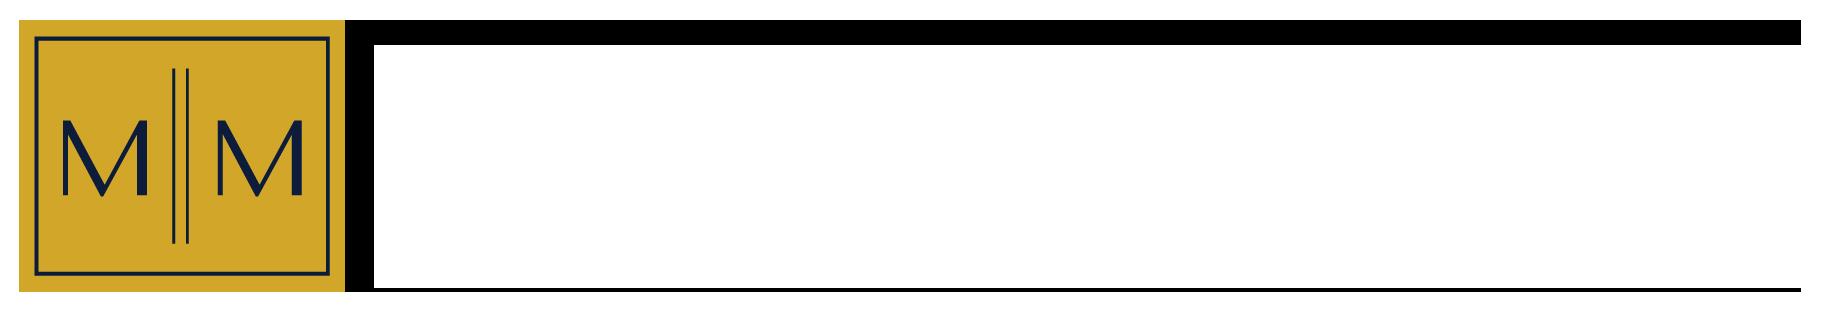 Law Office of Madeline M. McIntosh Logo